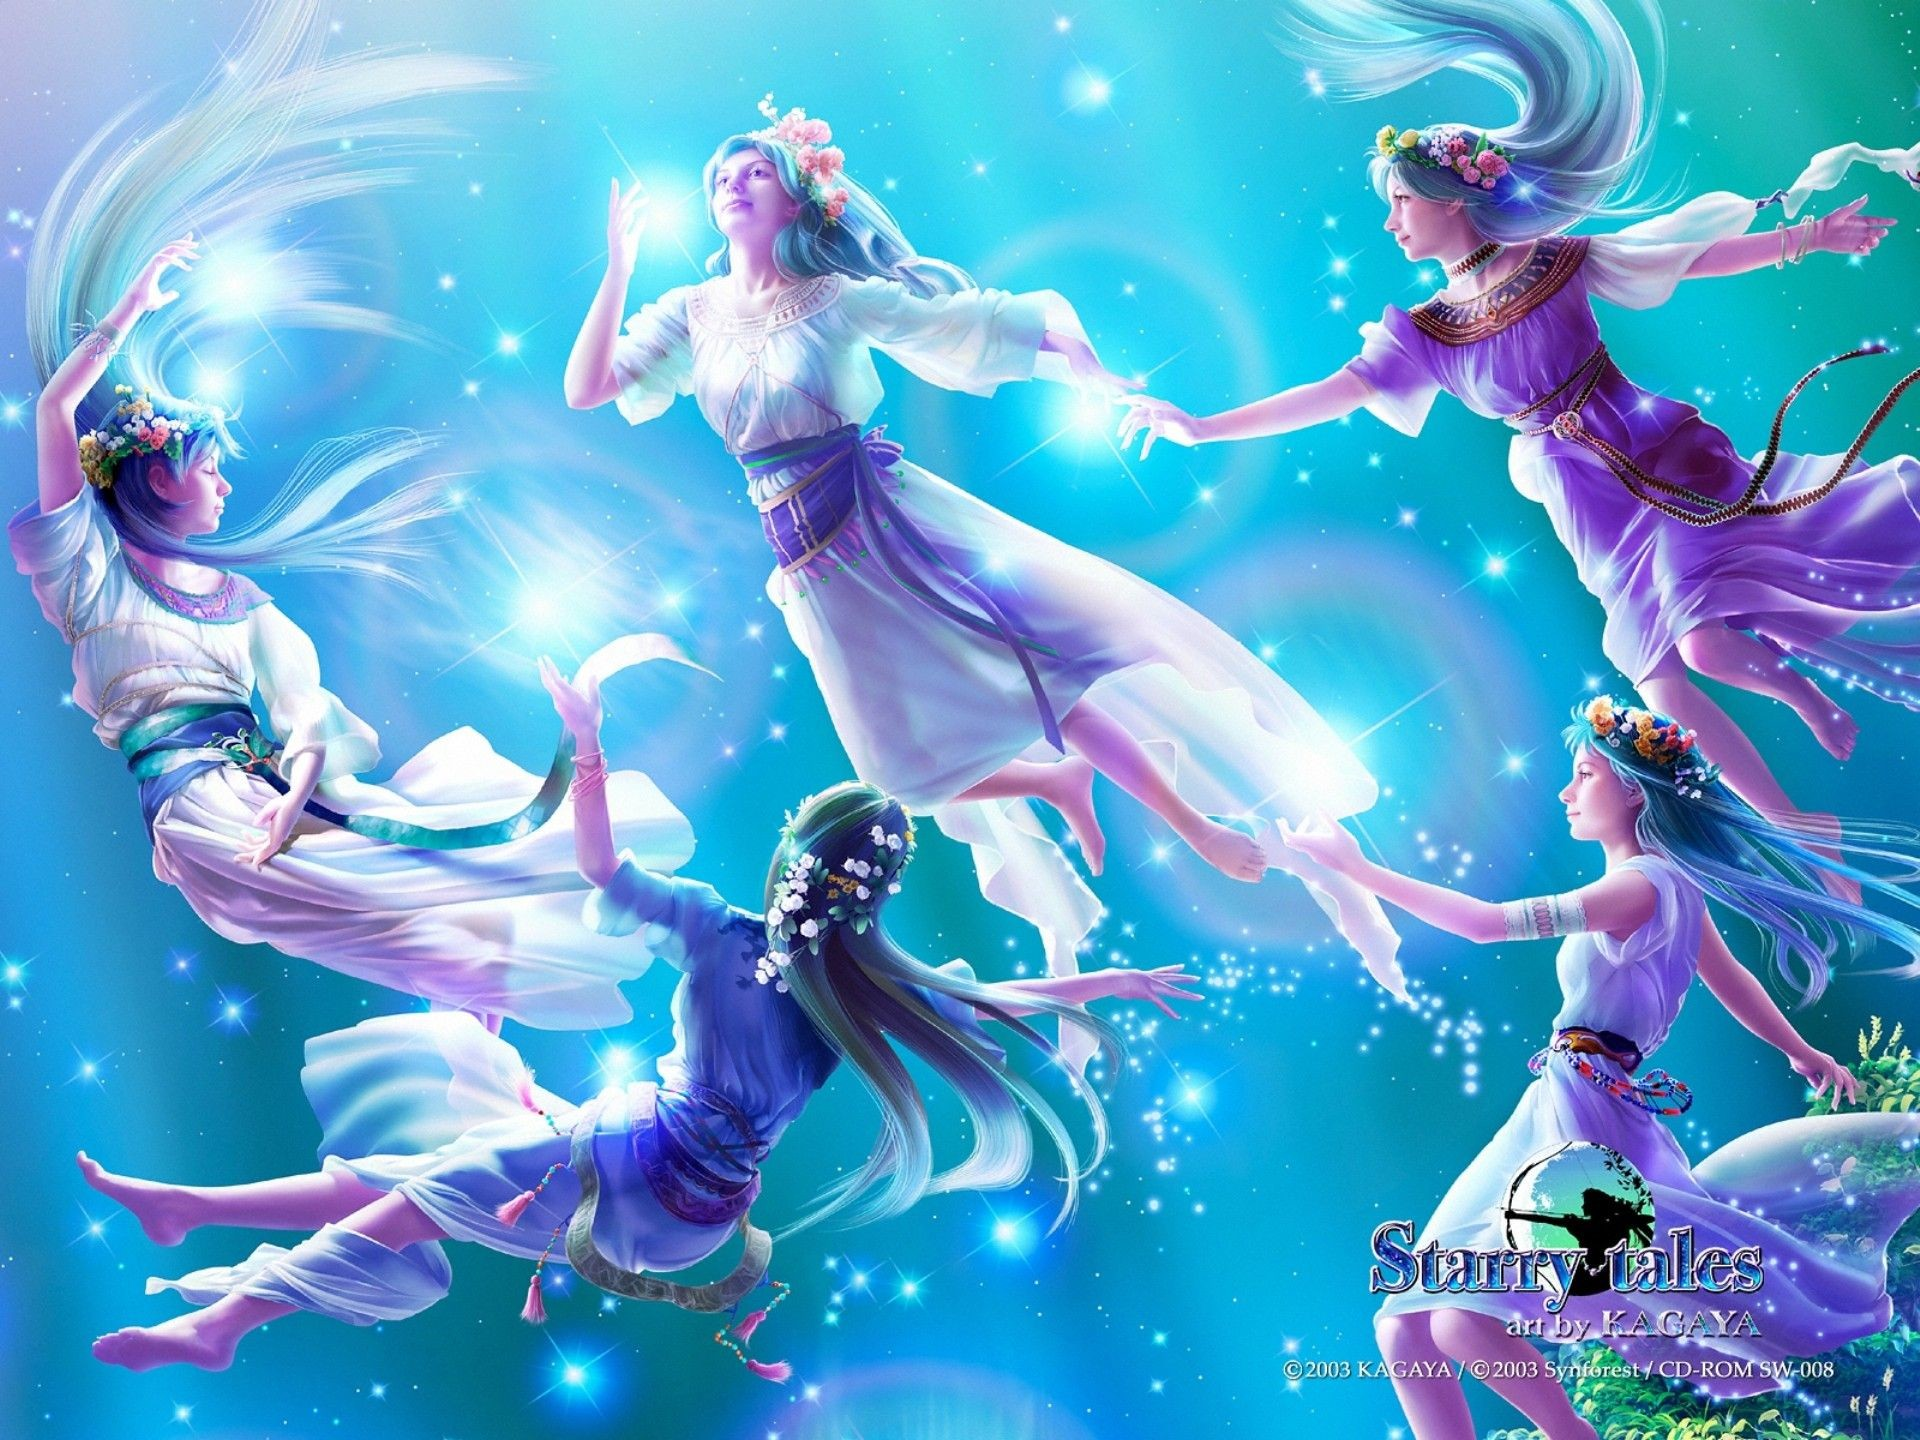 Res: 1920x1440, kagaya art / constellations and mythologies / starry tales / pleiades